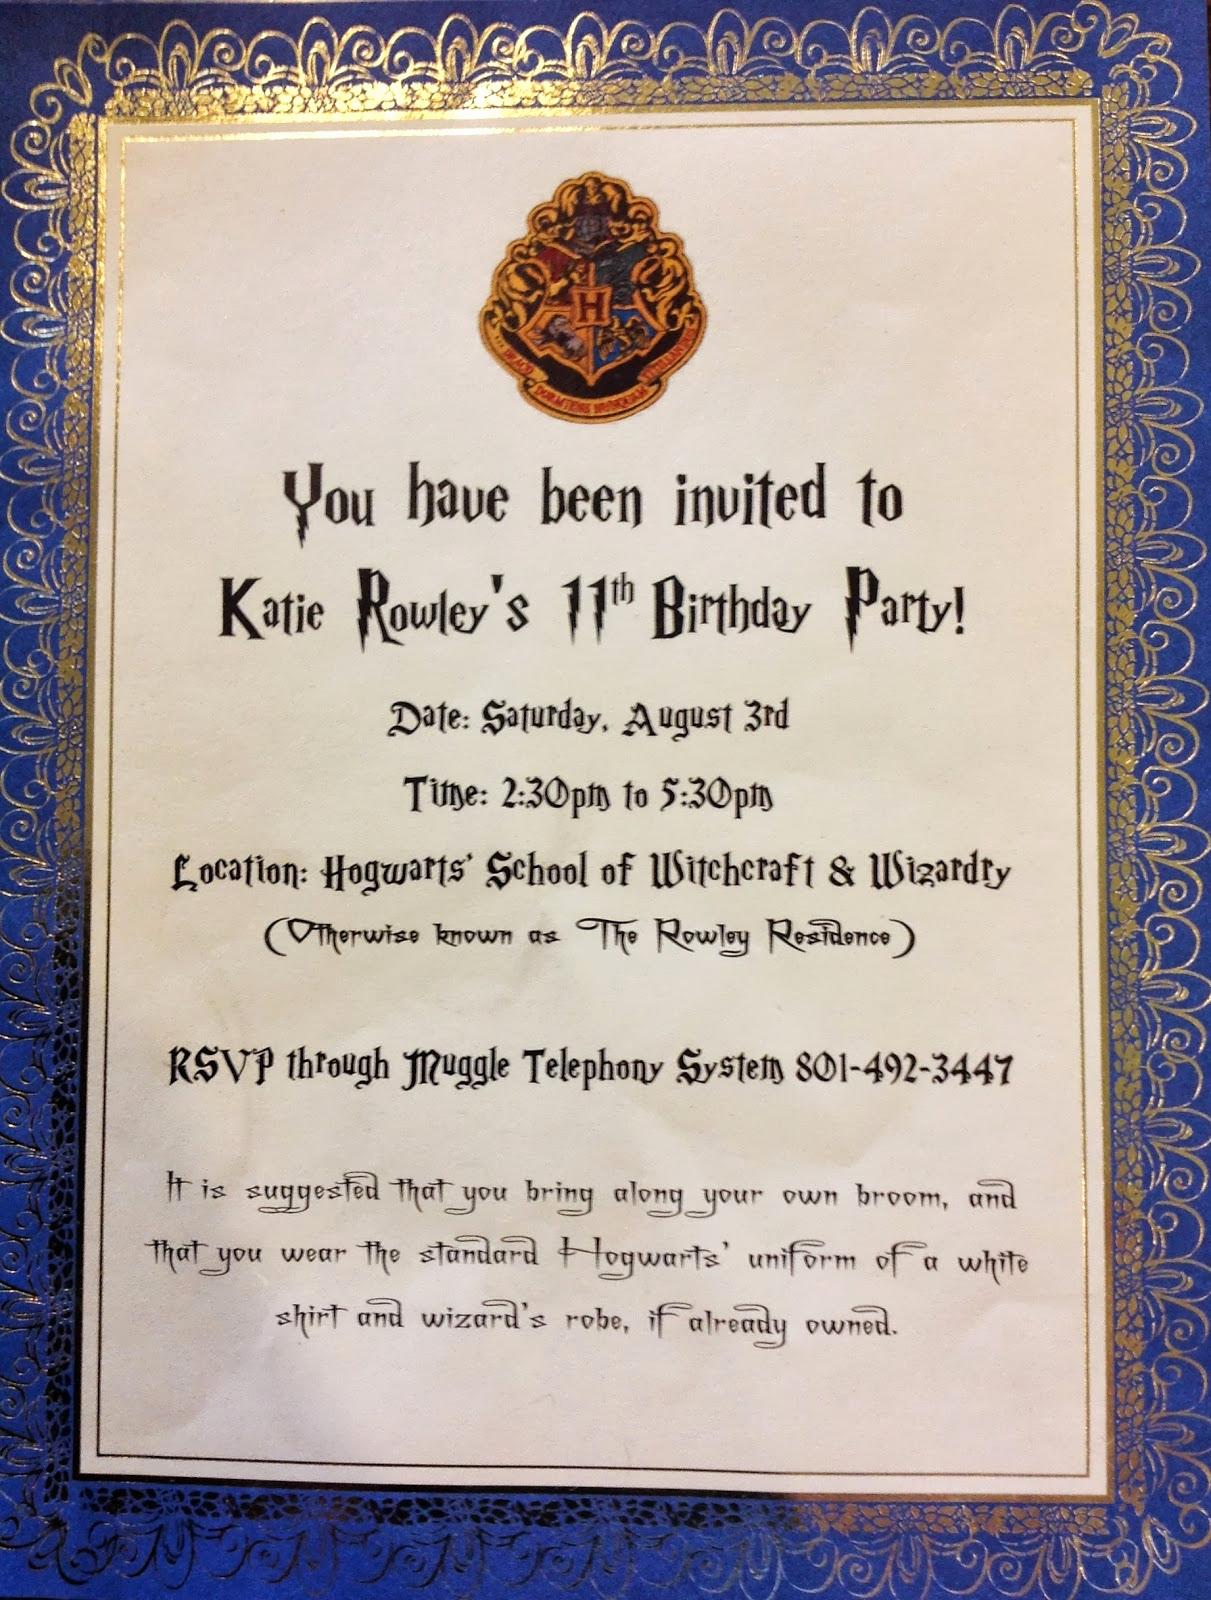 Harry Potter Birthday Invitation Luxury Puddle Wonderful Learning Harry Potter Birthday Party